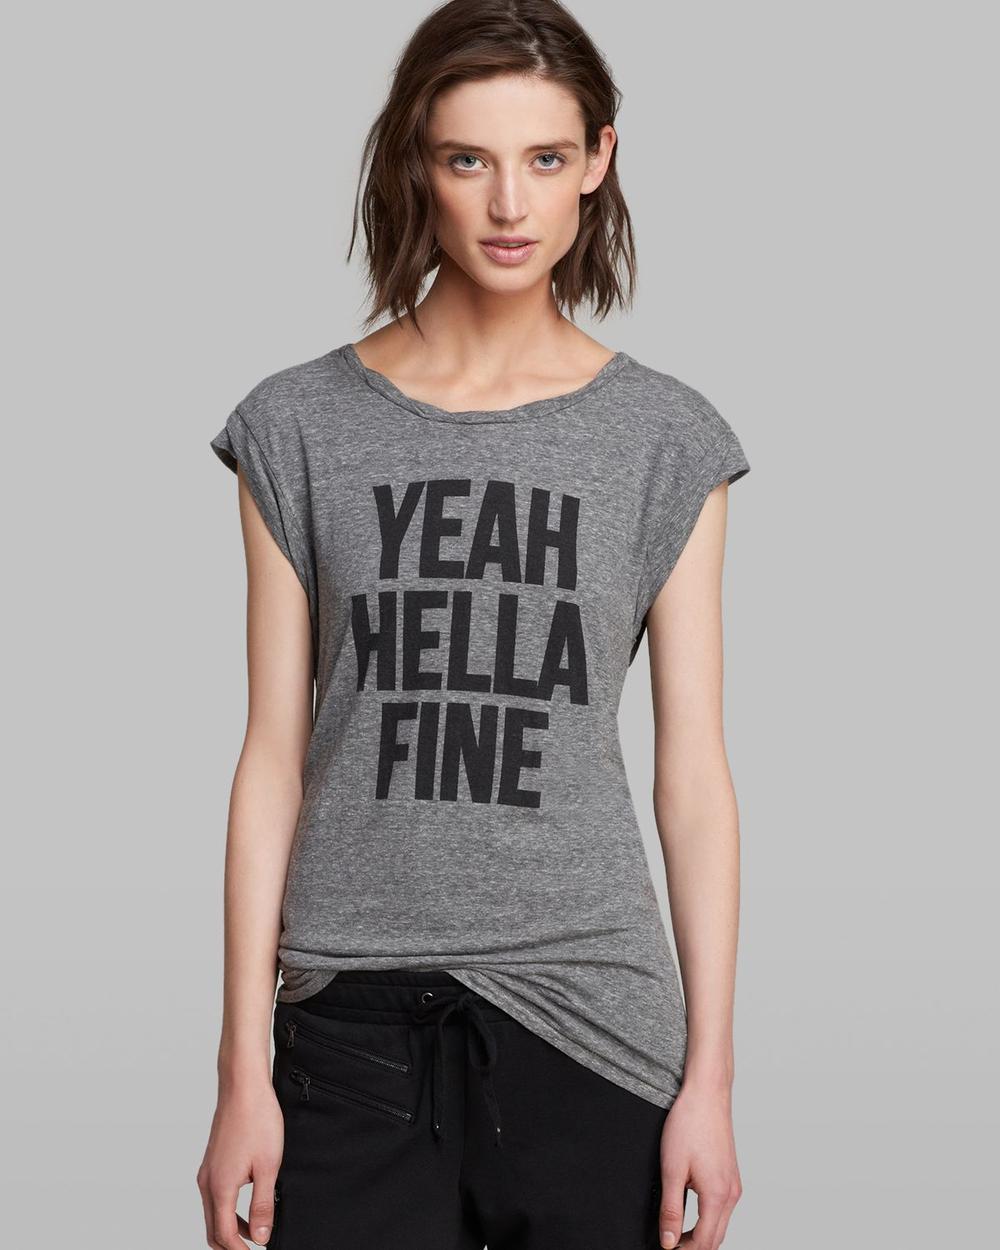 pam-gela-gray-muscle-tee-logo-print-slash-back-t-shirts-product-1-21032331-1-203436300-normal.jpeg